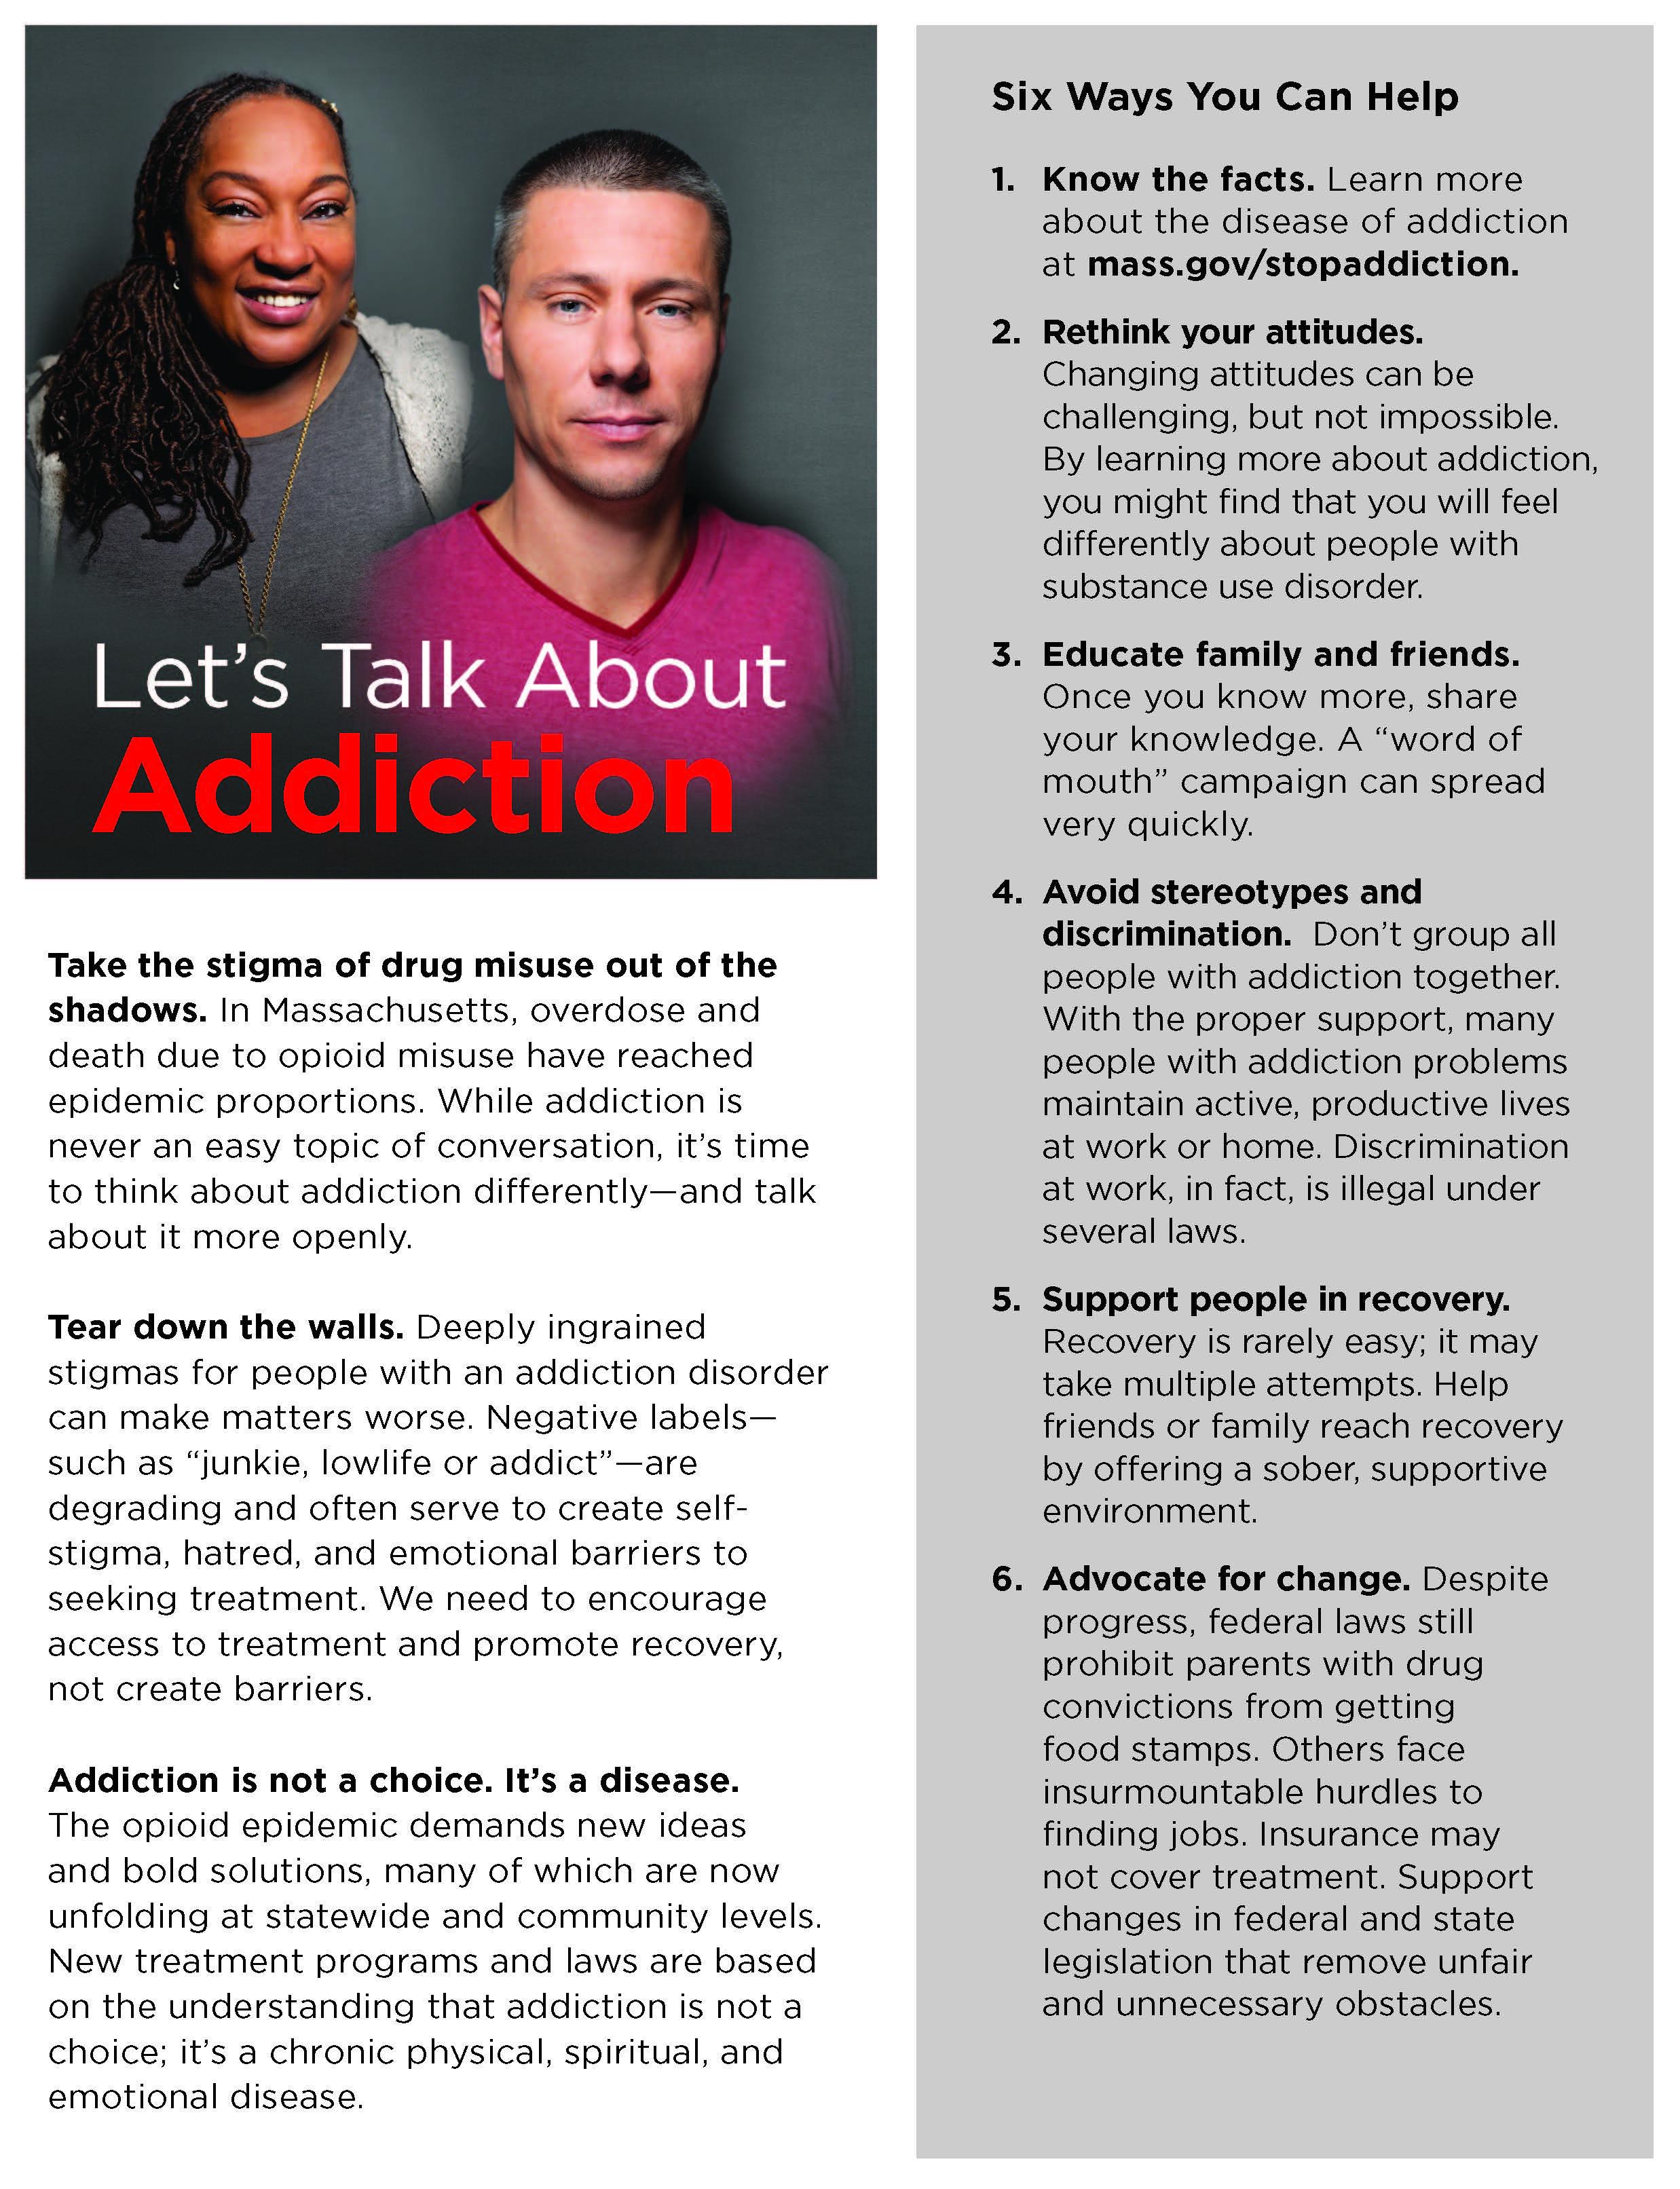 Talk About Addiction Fact Sheet